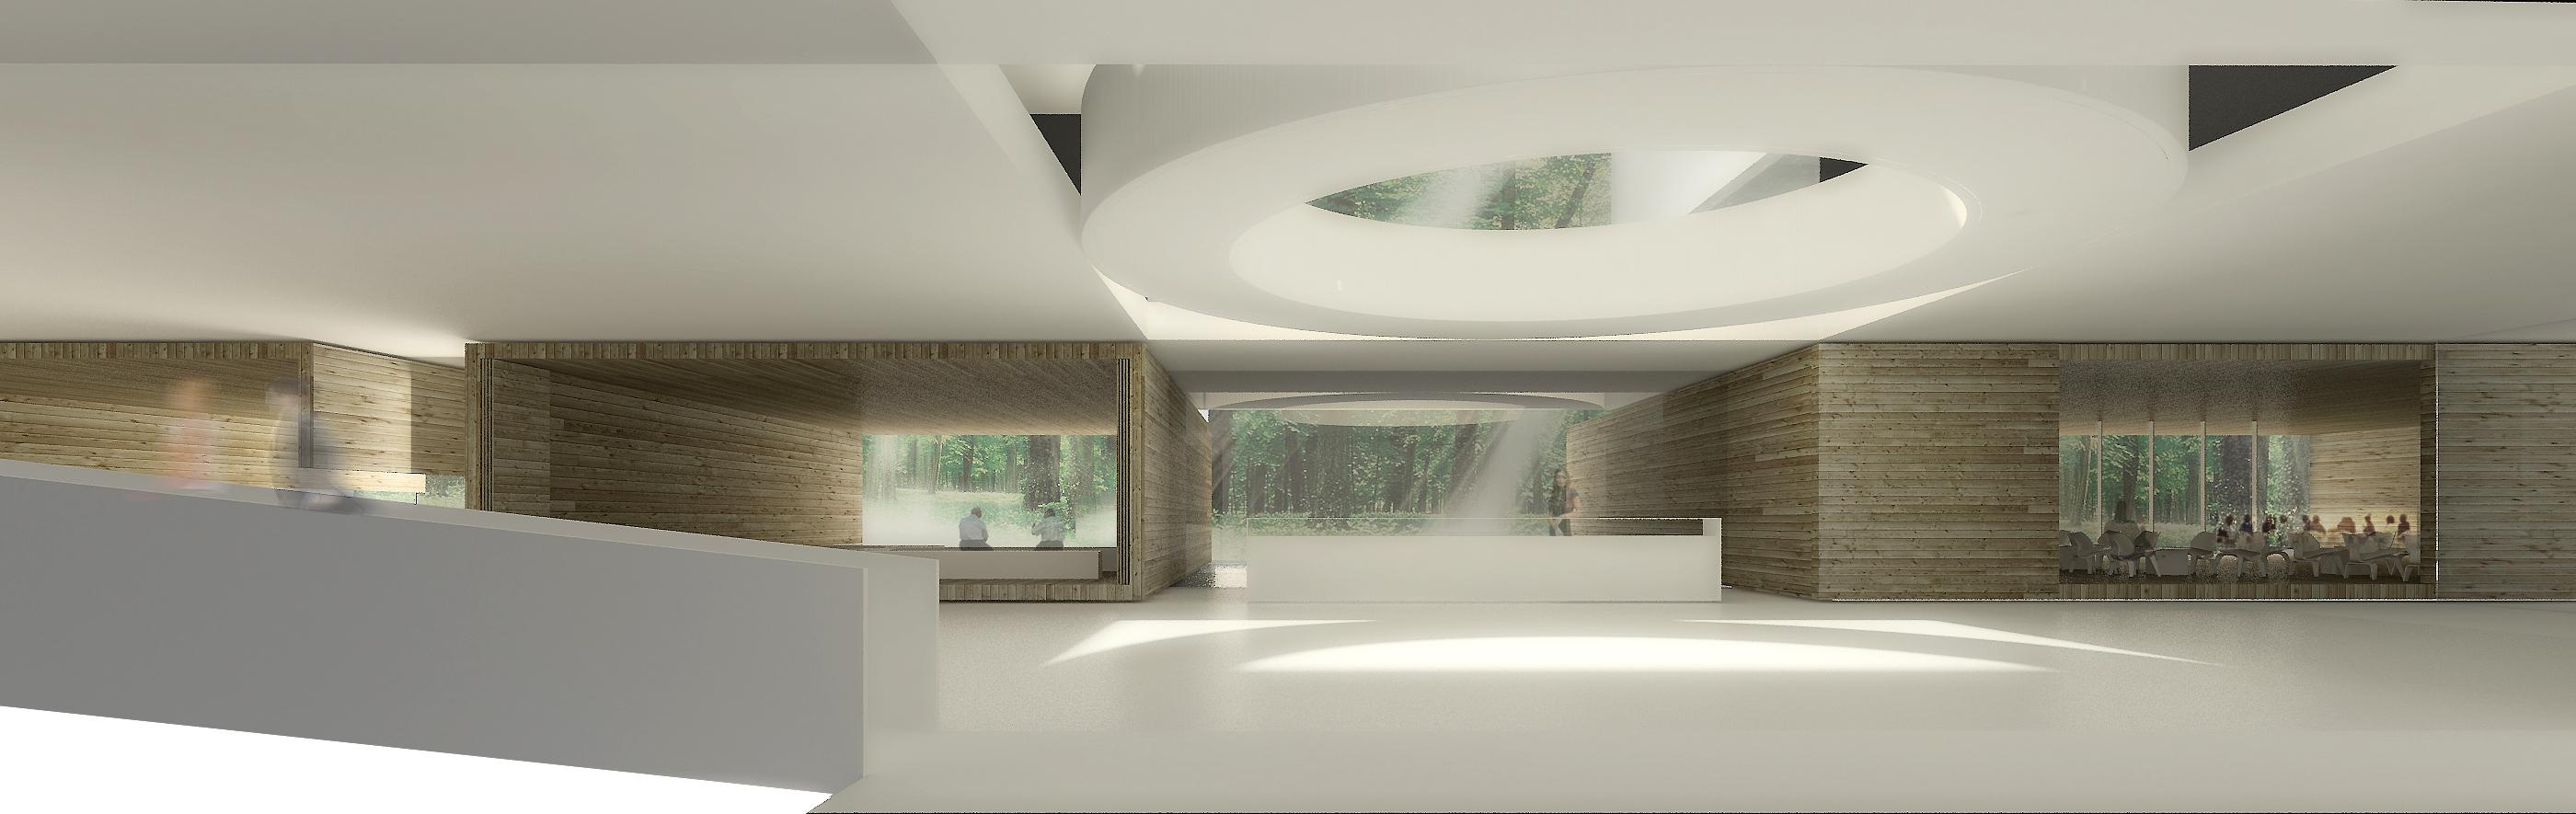 planell-hirsch_concurso_arquitectura_calvia 03